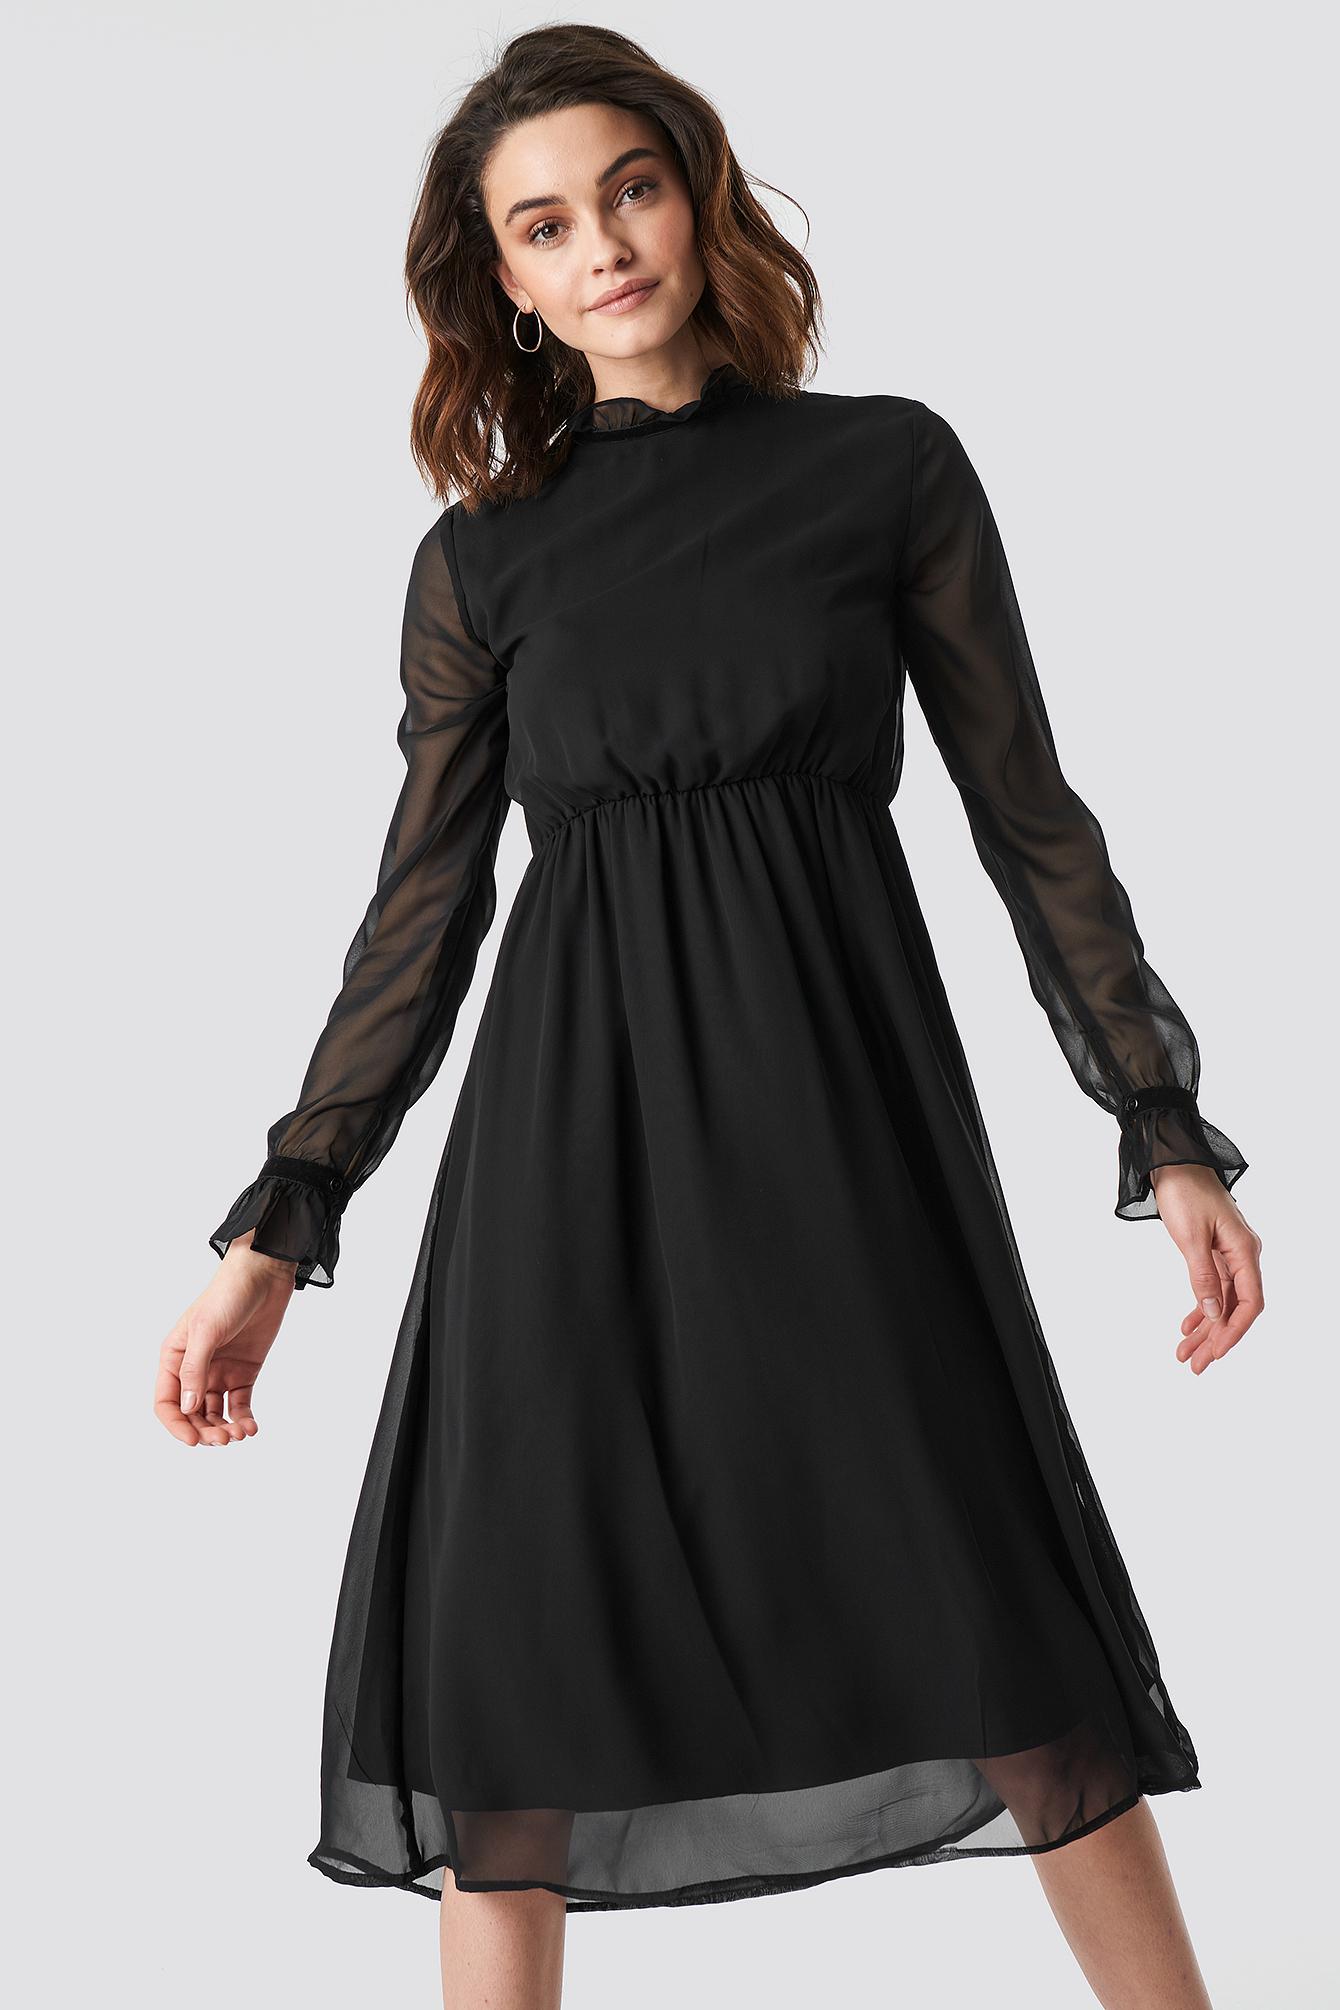 Frill Detail High Neck Chiffon Dress NA-KD.COM